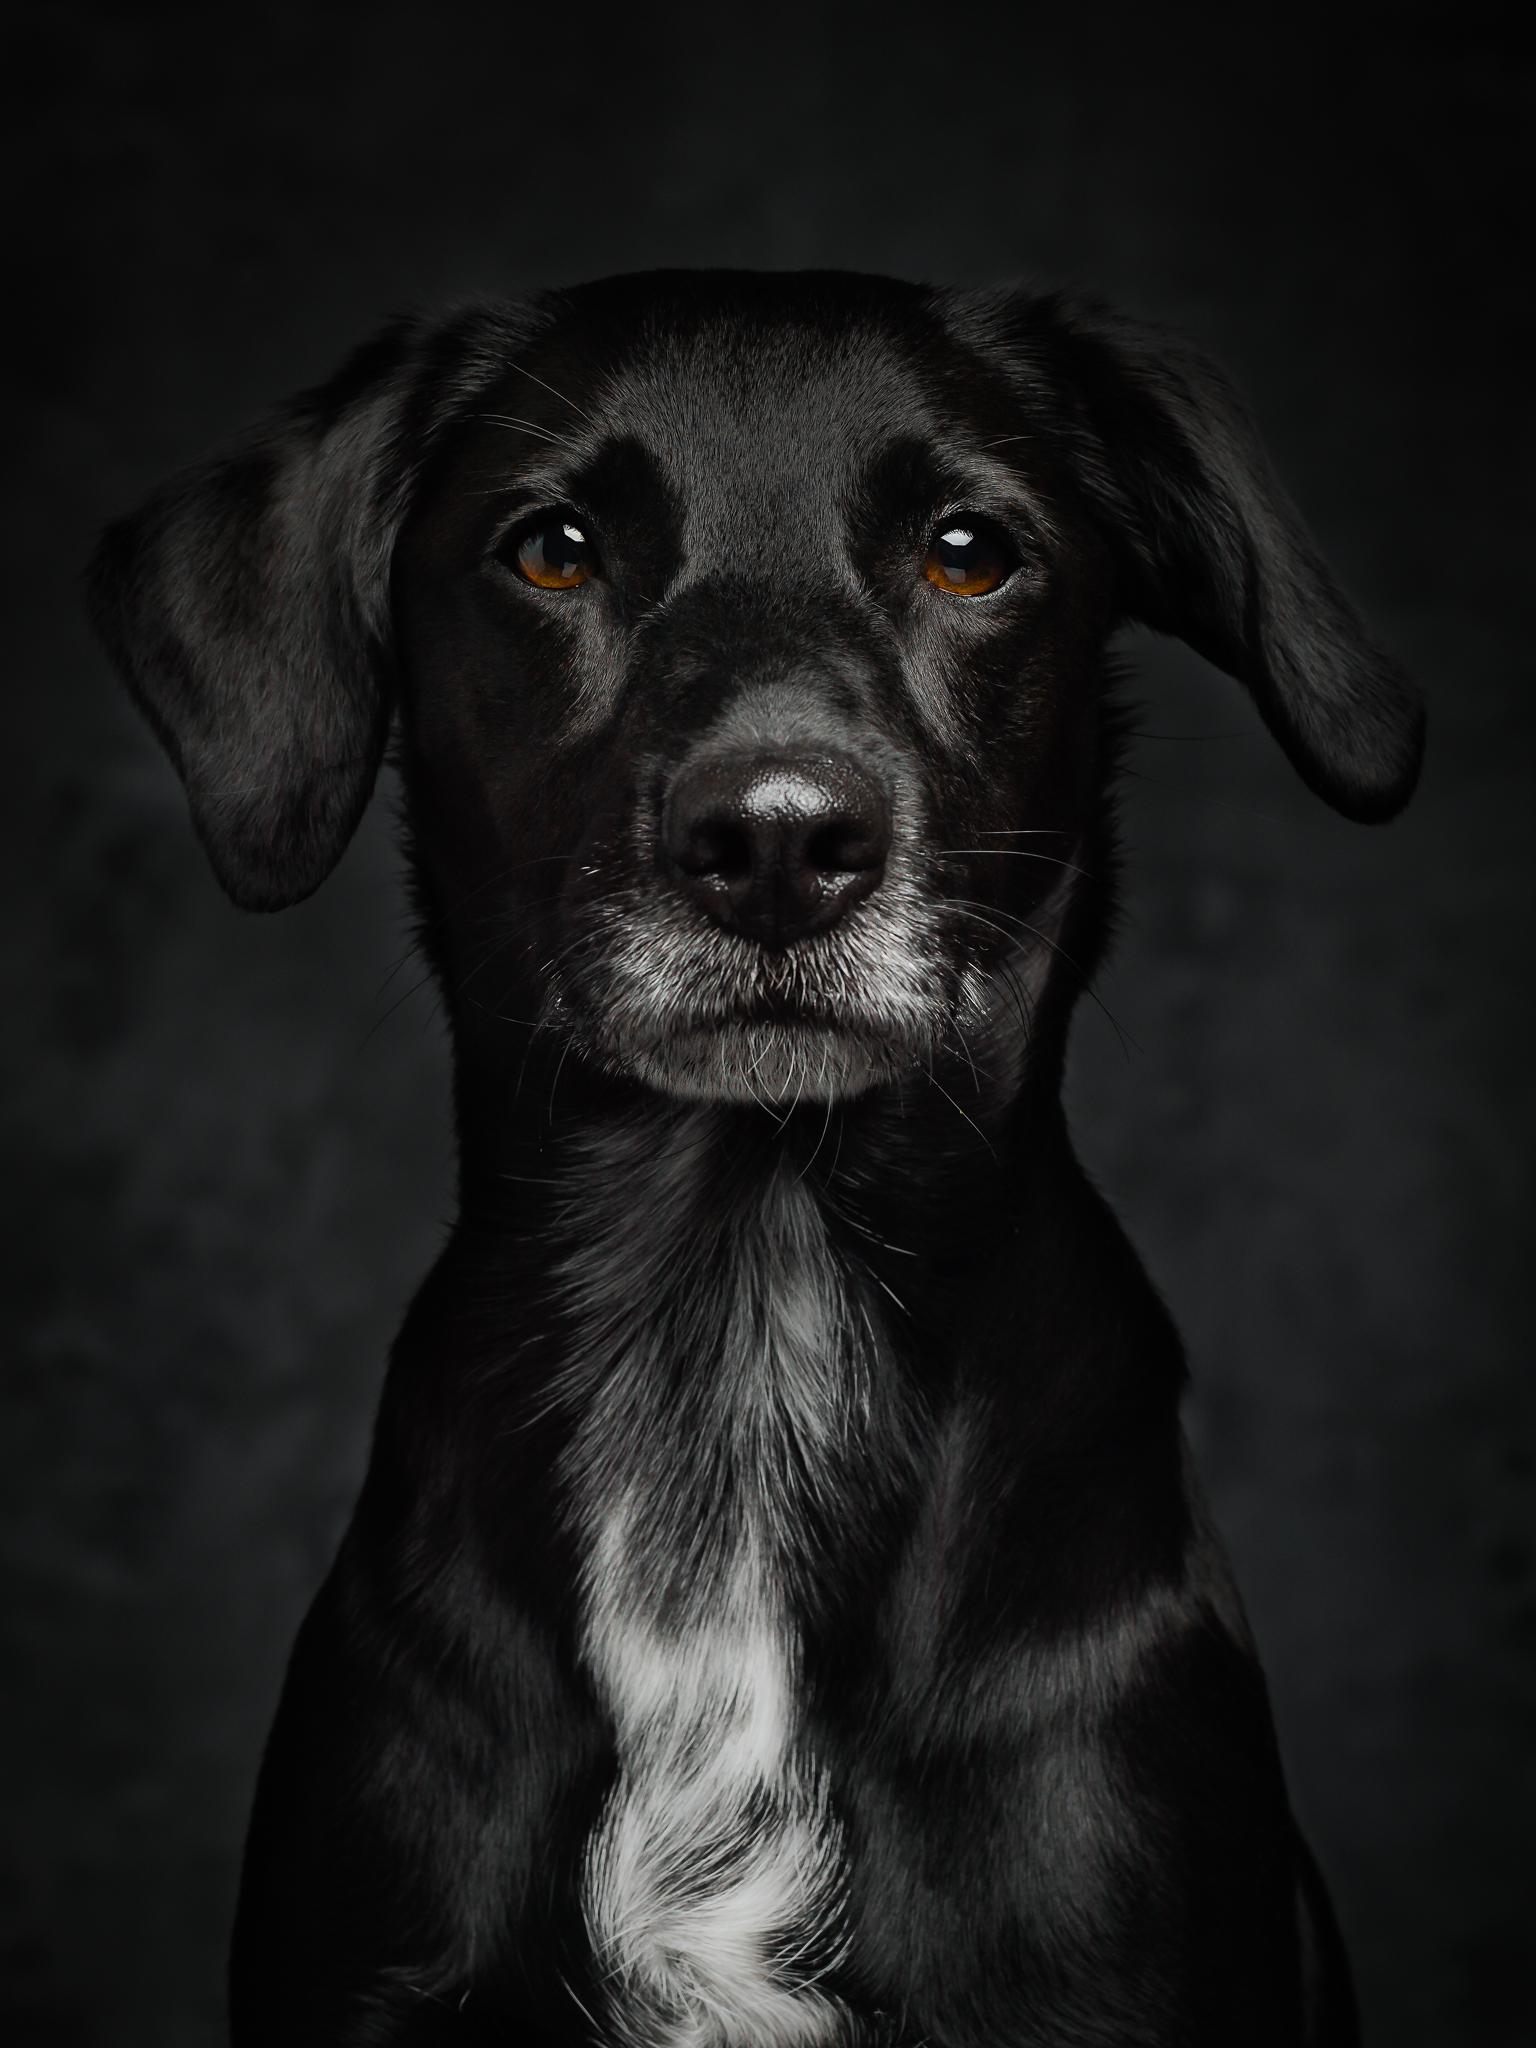 klaus-dyba-dog-photography